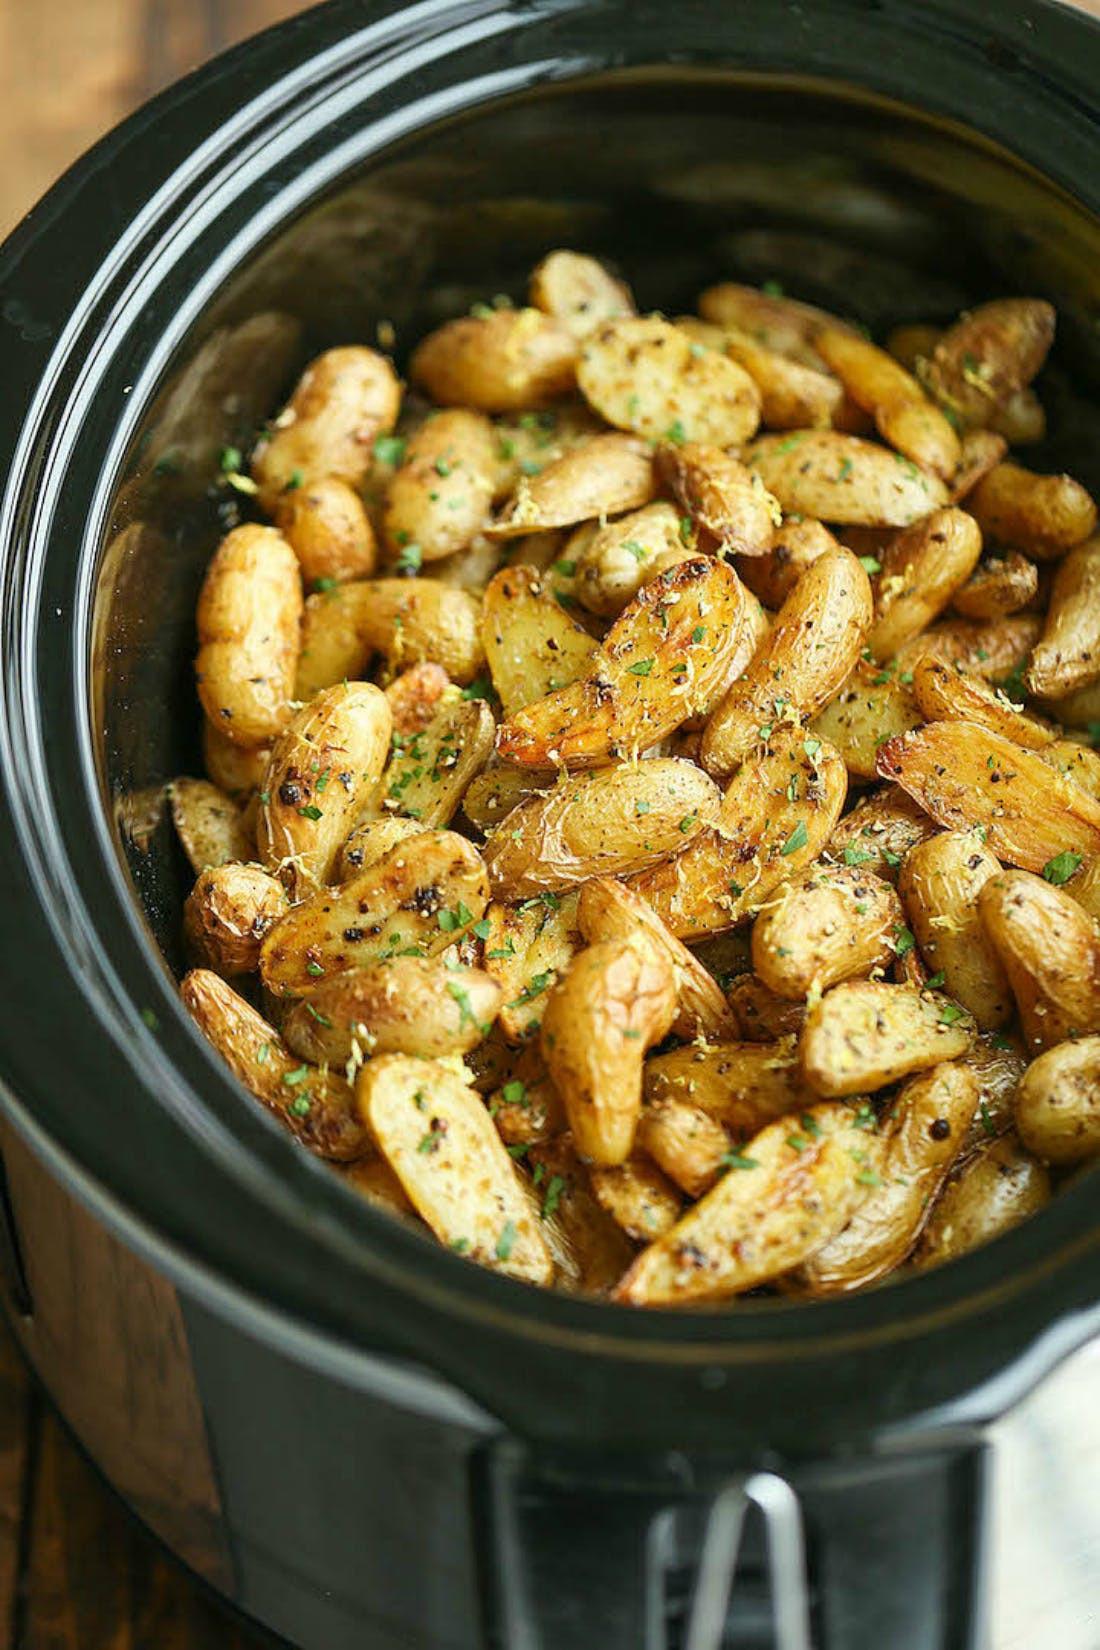 Vegetarian Crockpot Recipes  15 Crock Pot Recipes You Won't Believe Are Vegan